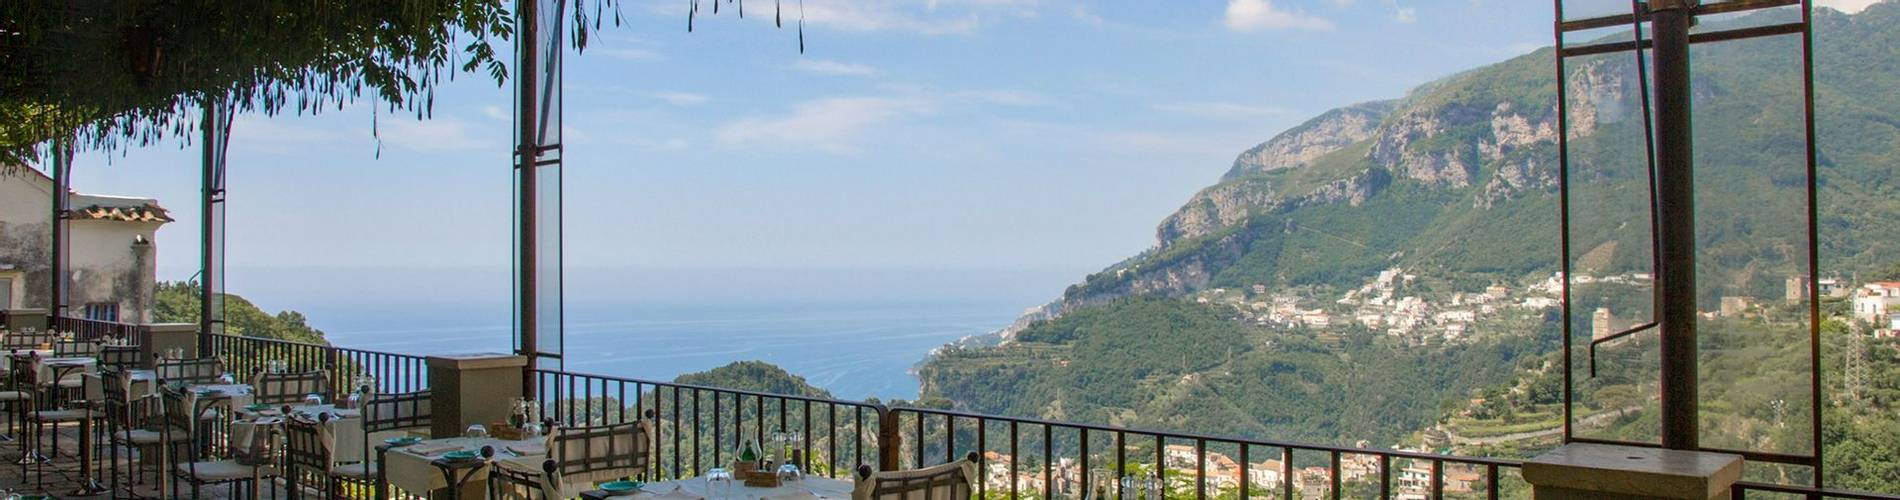 Villa Maria, Amalfi Coast, Italy, the terrace of teh restaurant.jpg